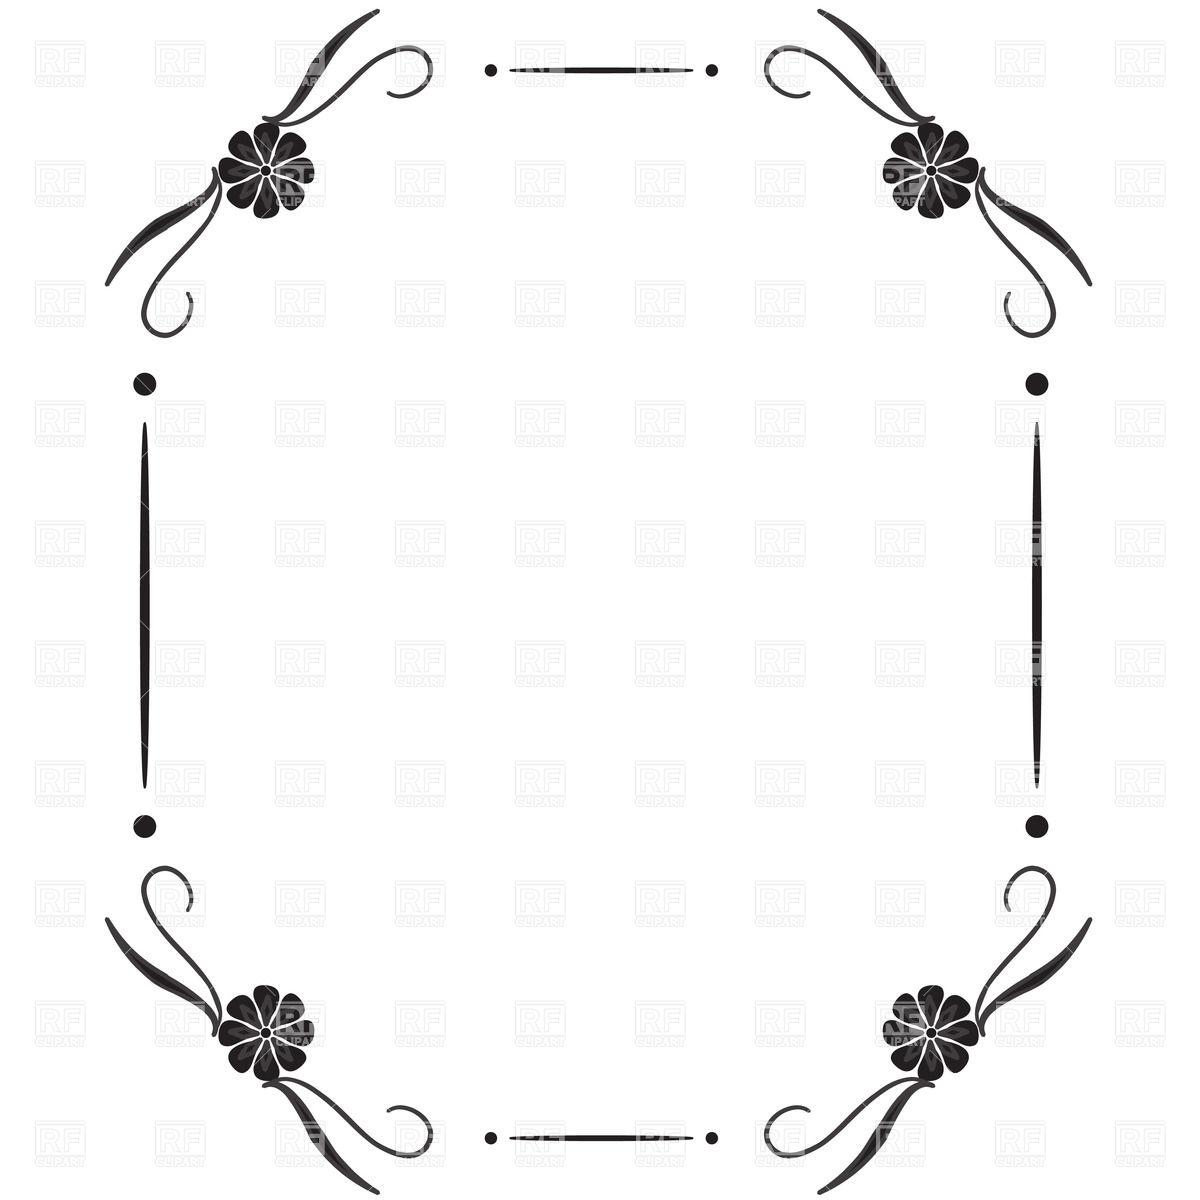 1200x1200 Simple Square Vintage Frame With Vignettes In Corner Vector Image